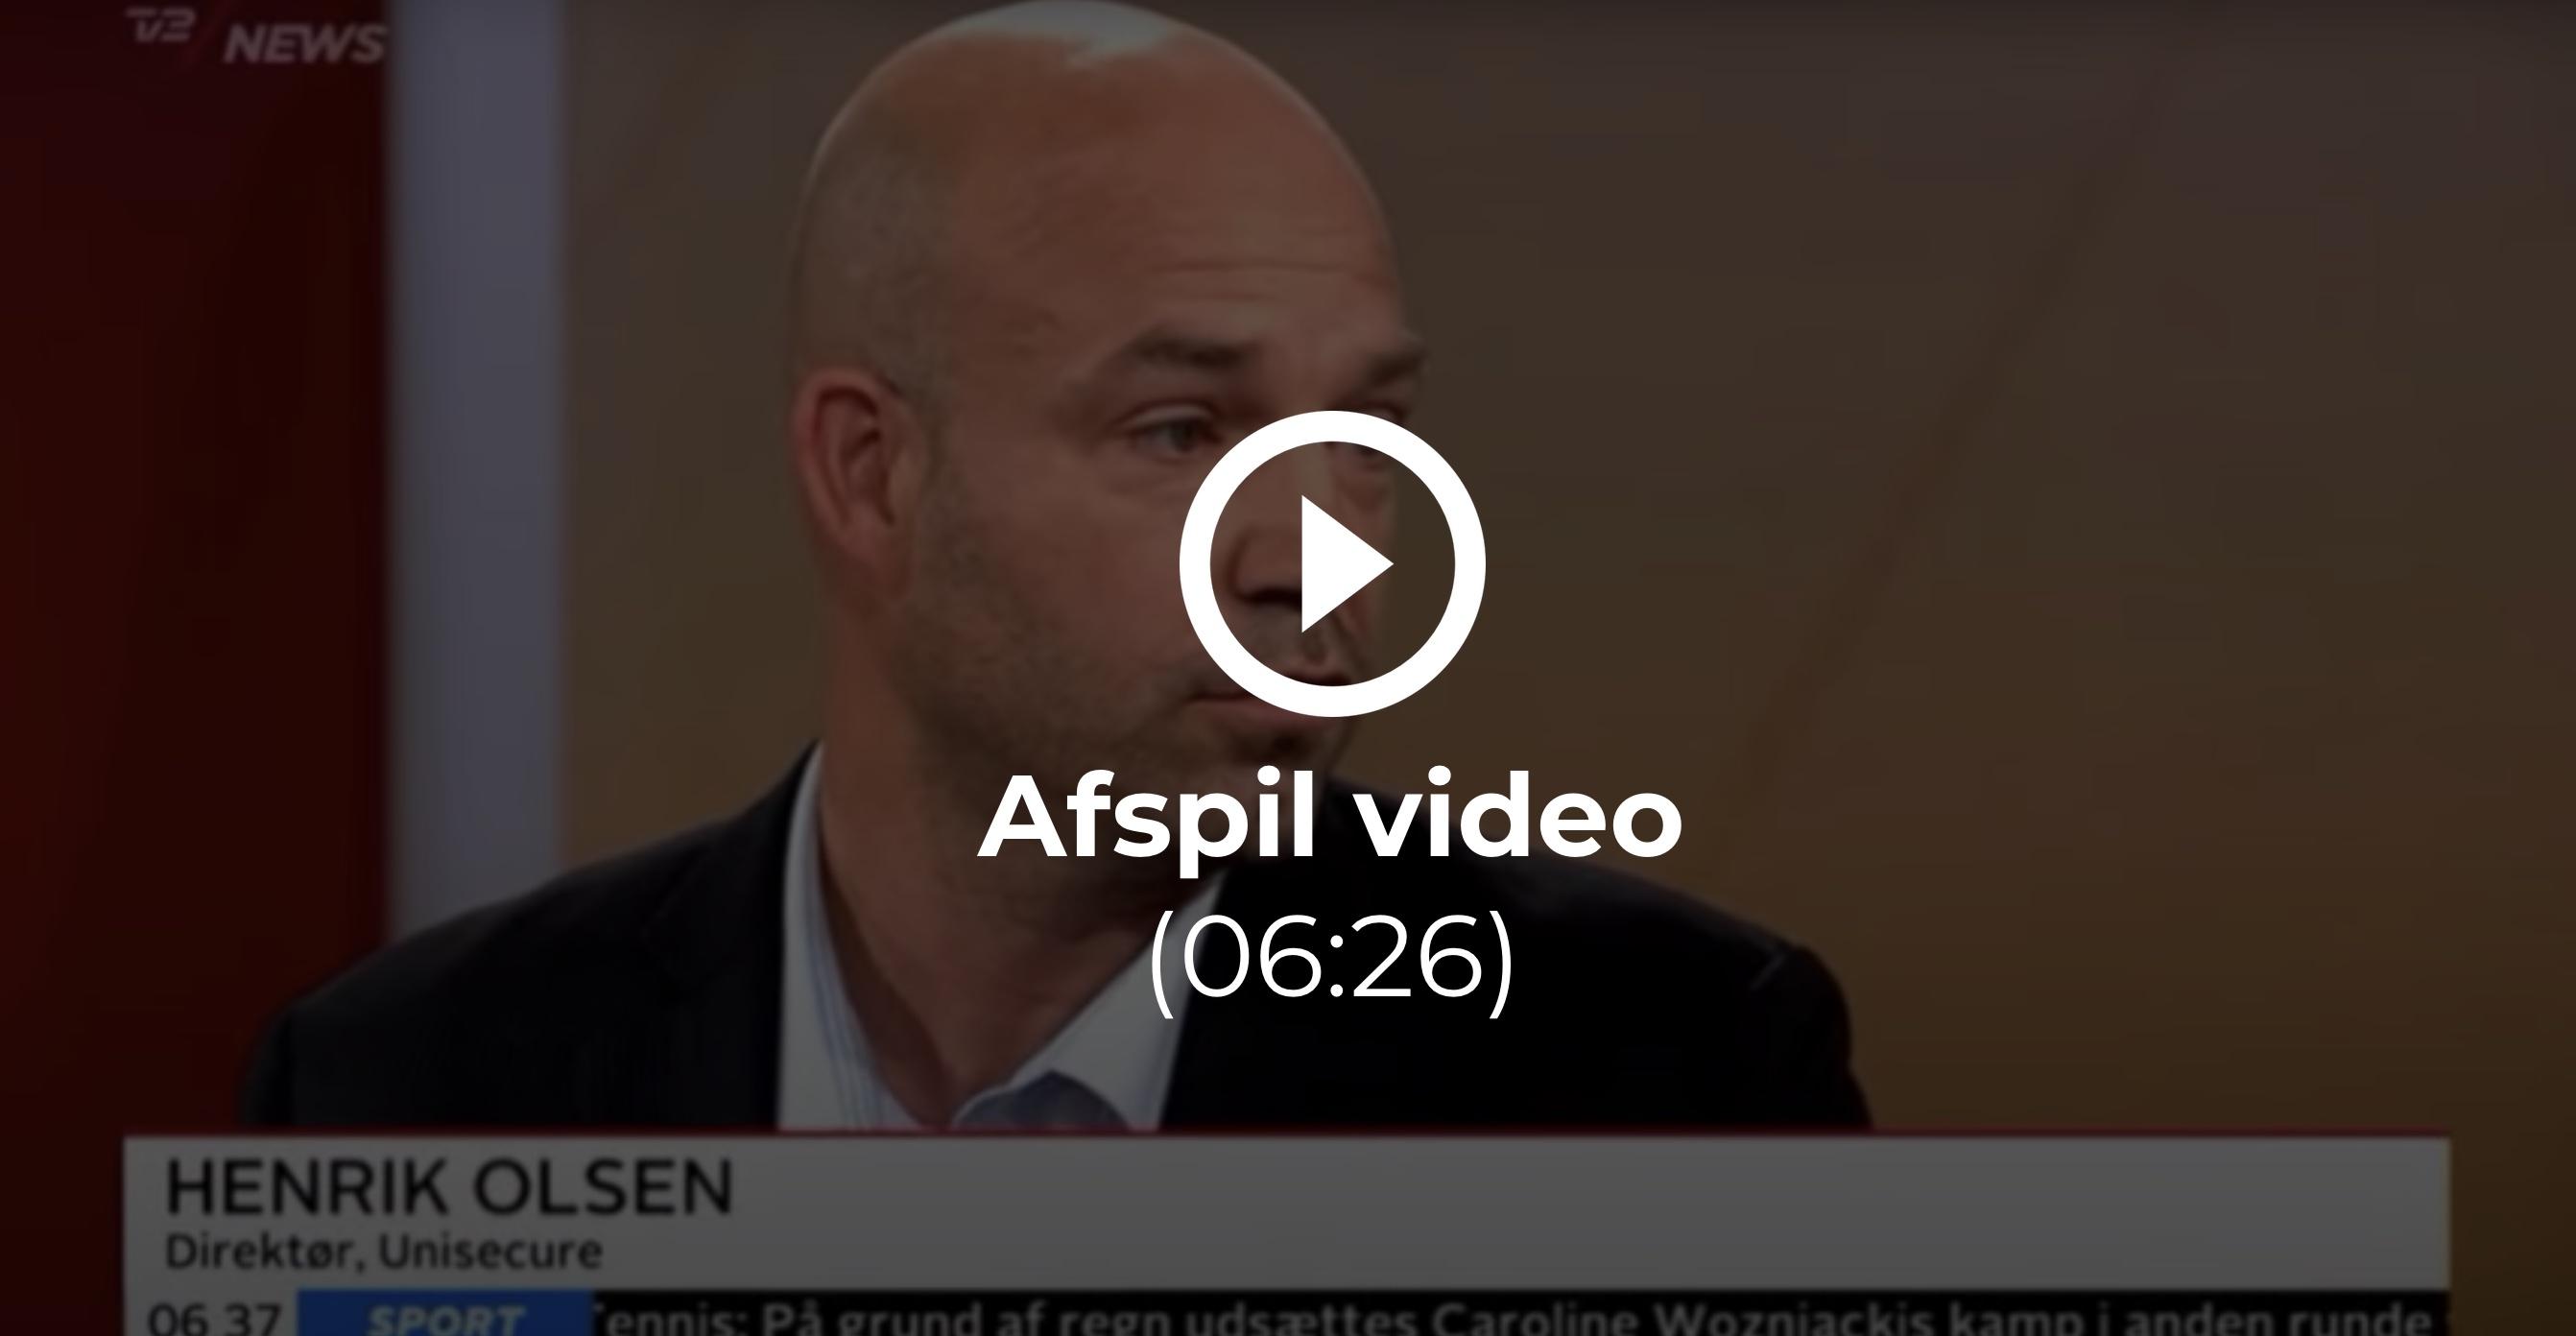 Video_dna_spray_tv2_news